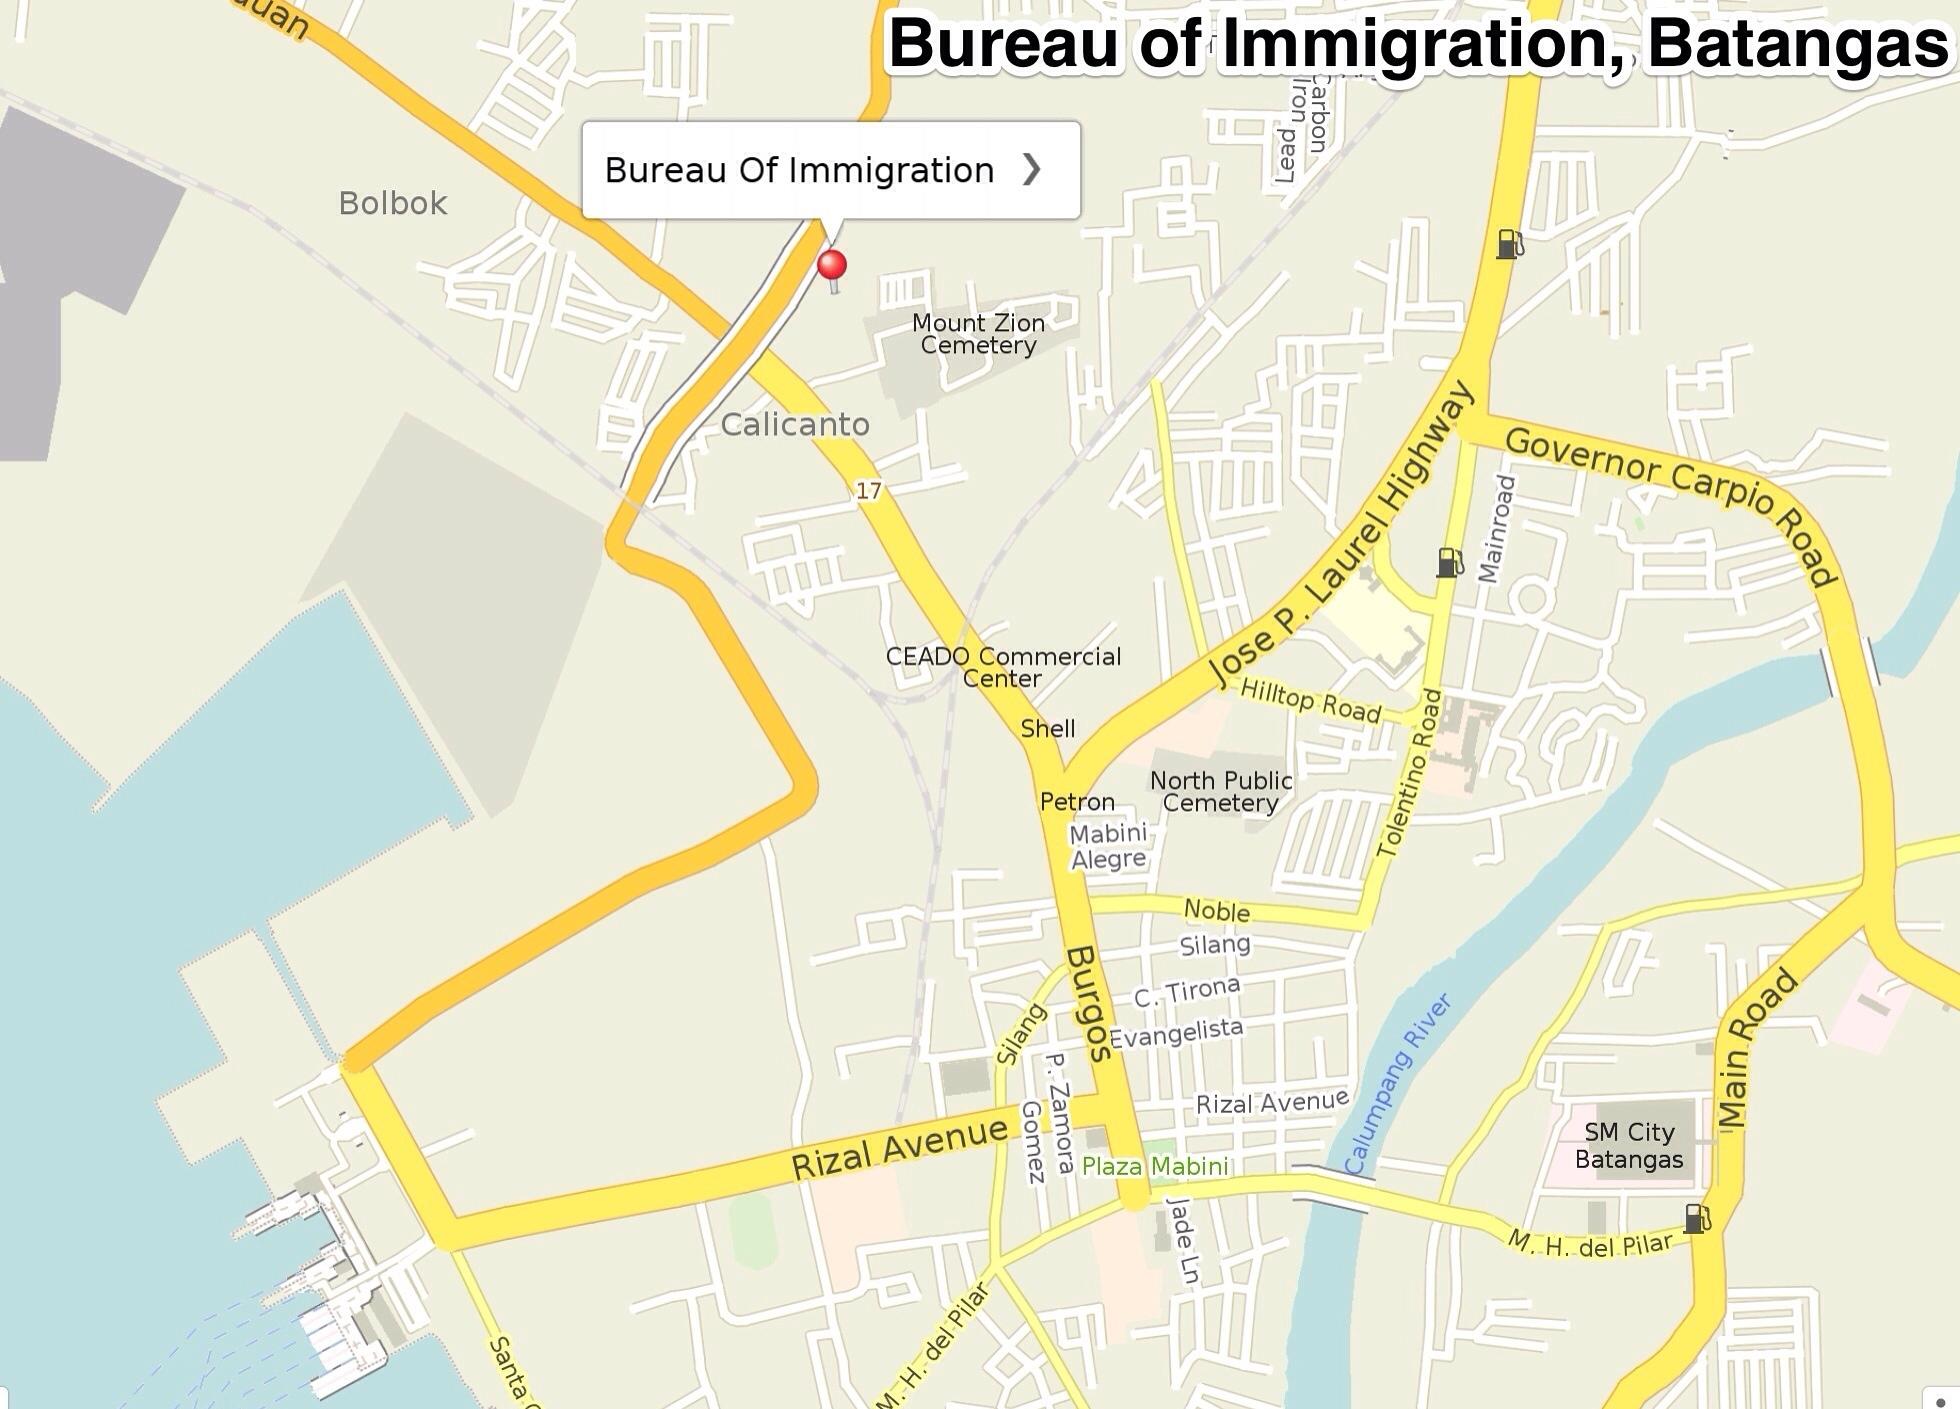 Bureau of immigration batangas